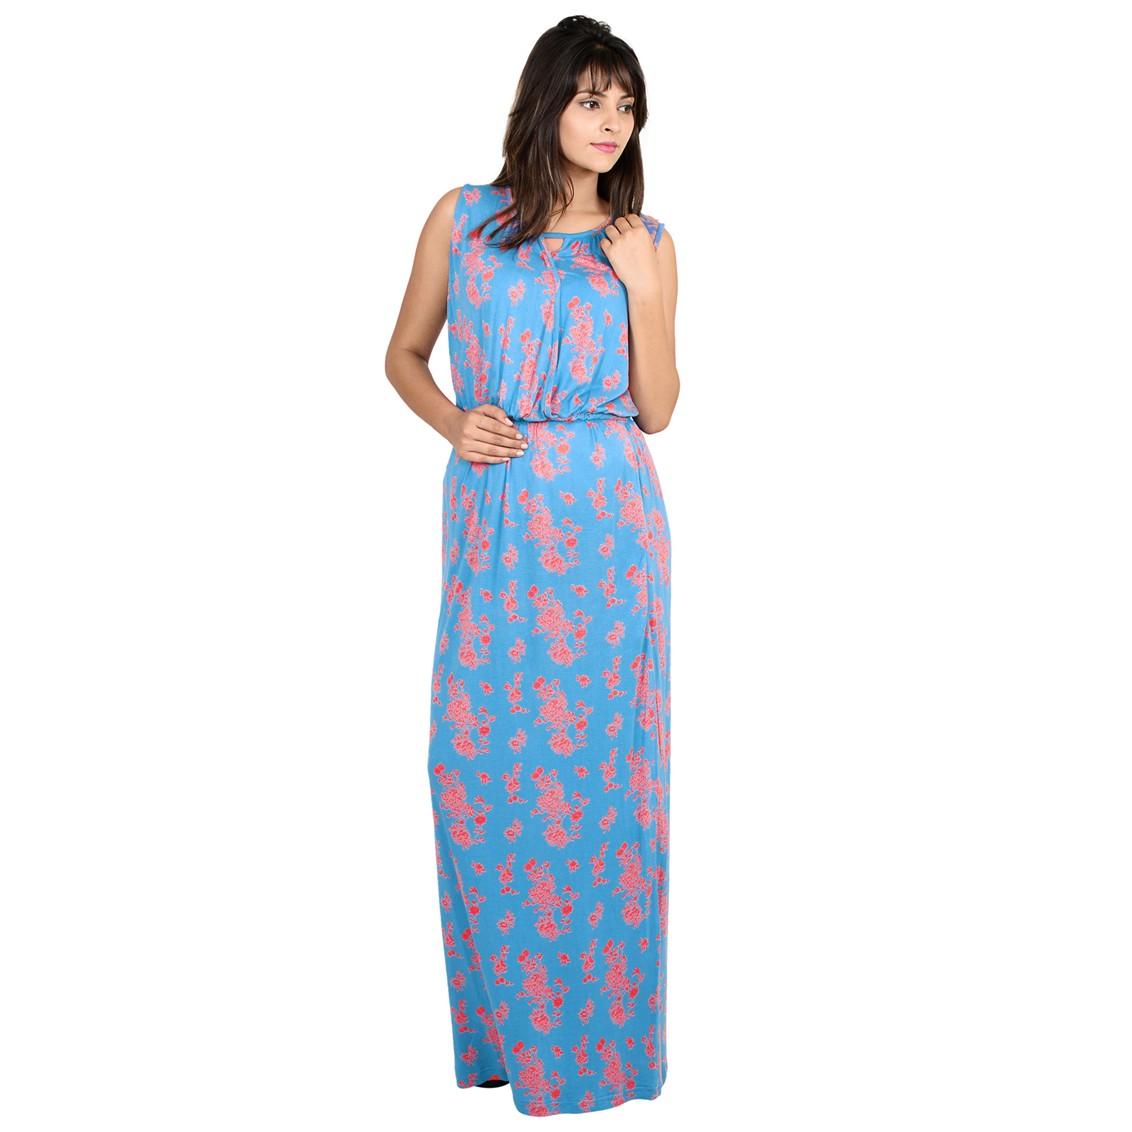 65751e4f69522 9teenagain Floral print nursing maxi dress (Blue) - All Maternity ...